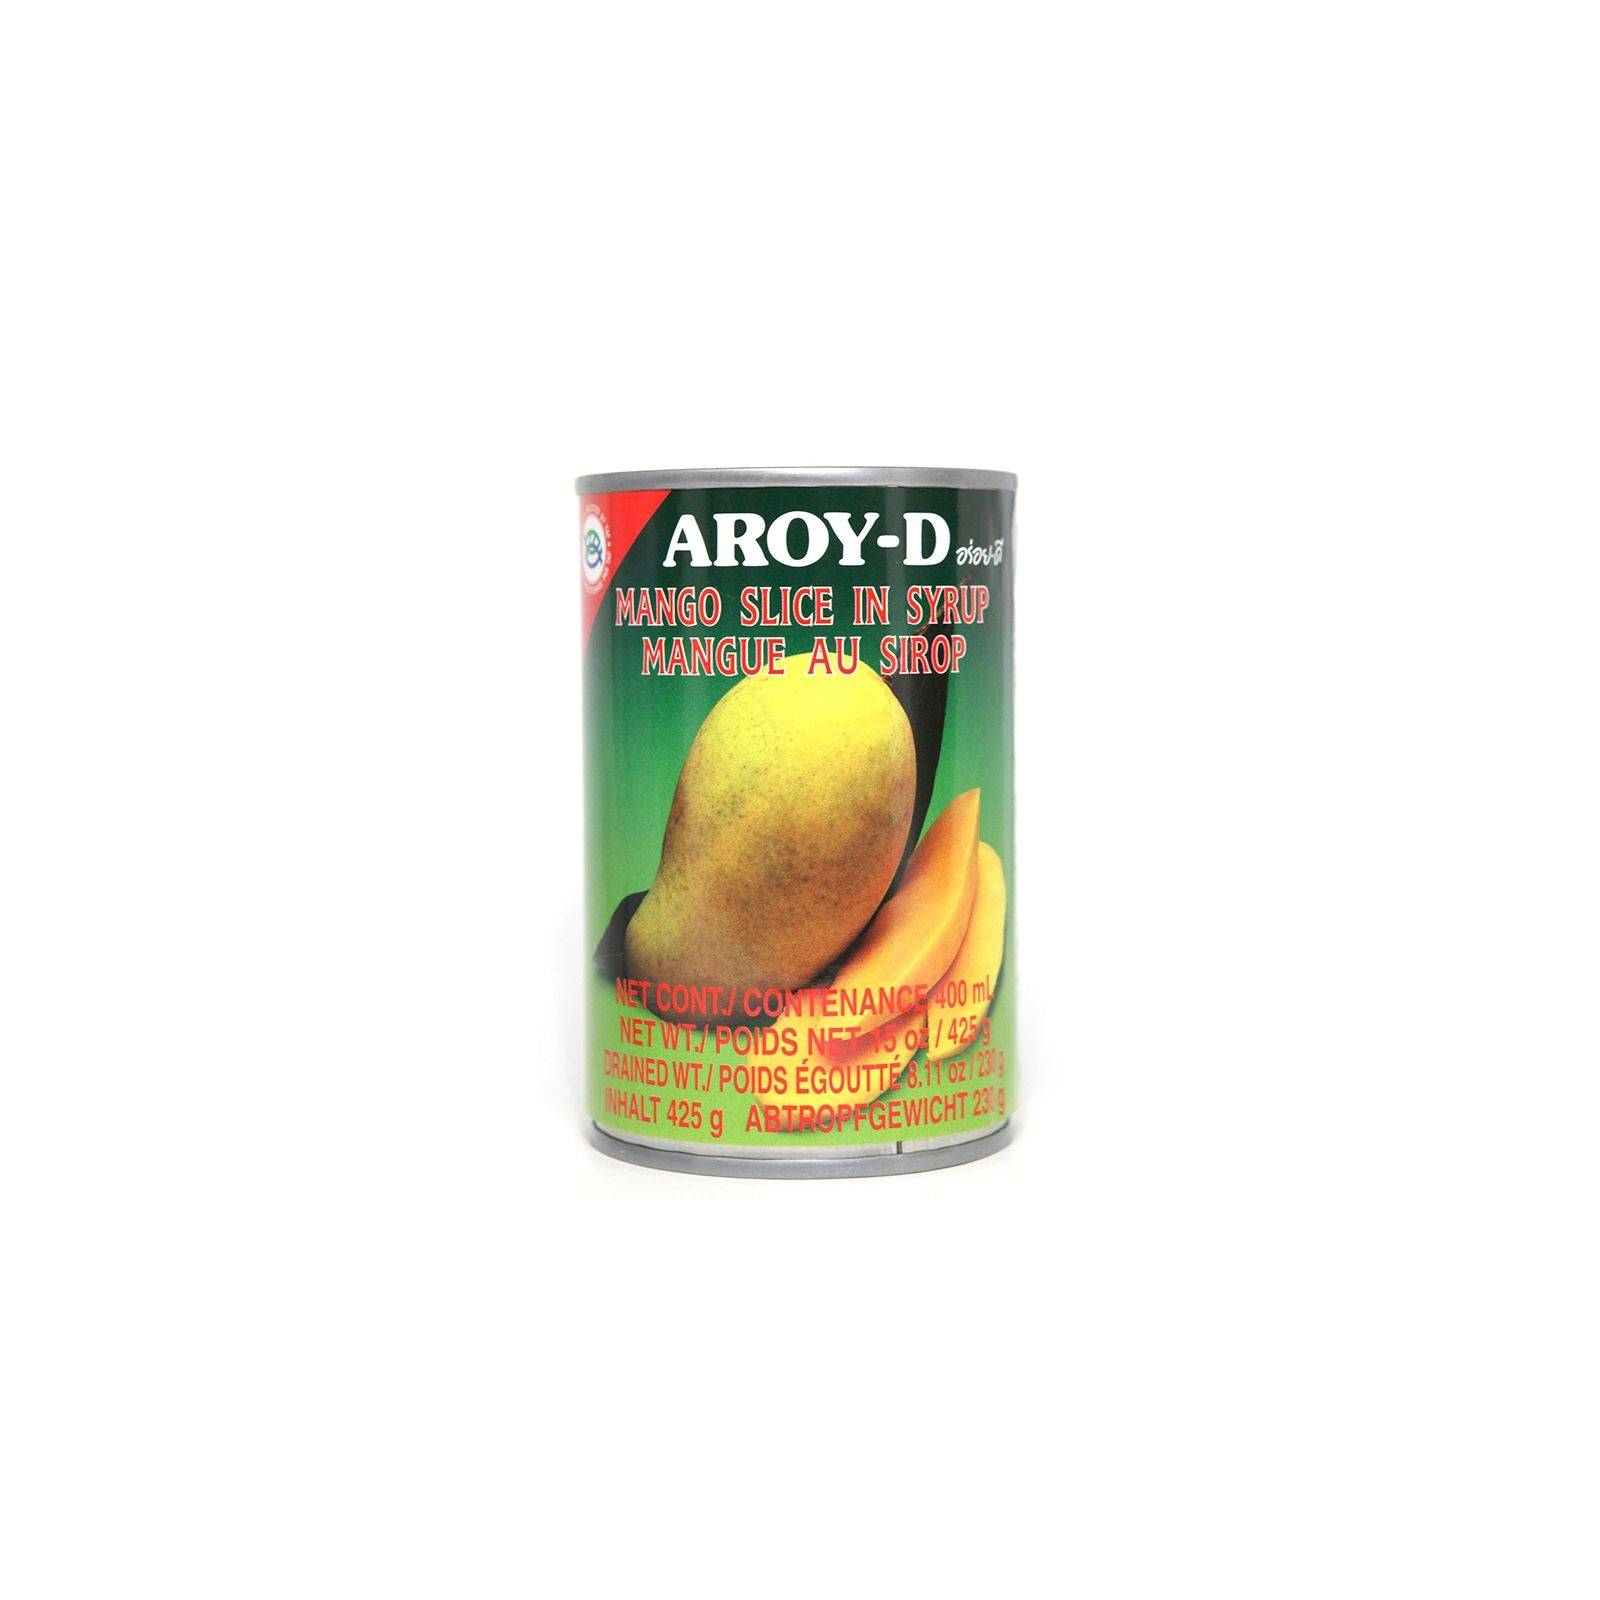 Asia Marché Mangue au sirop 425g Aroy-D